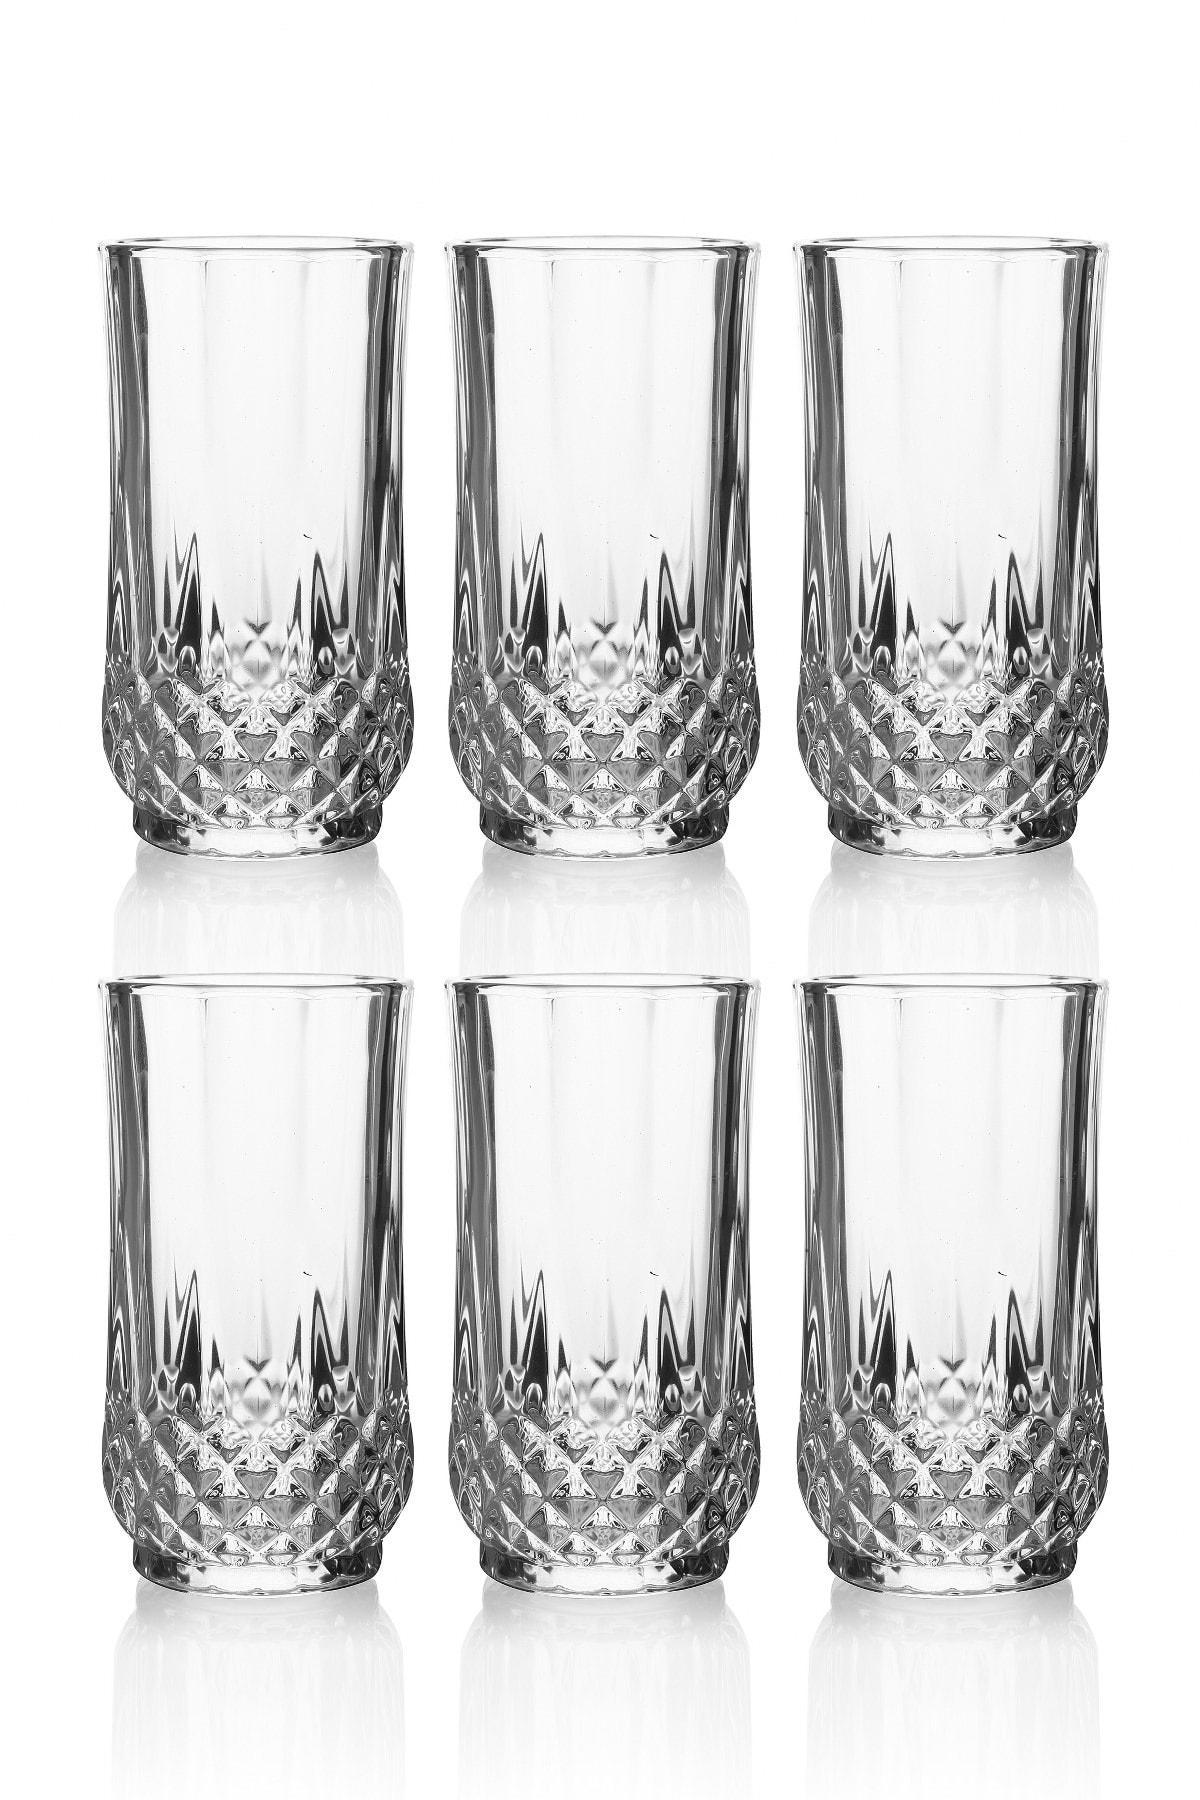 Queen's Kitchen Beyaz Kristal Kesme 6'lı Lüx Uzun Meşrubat Bardağı 1